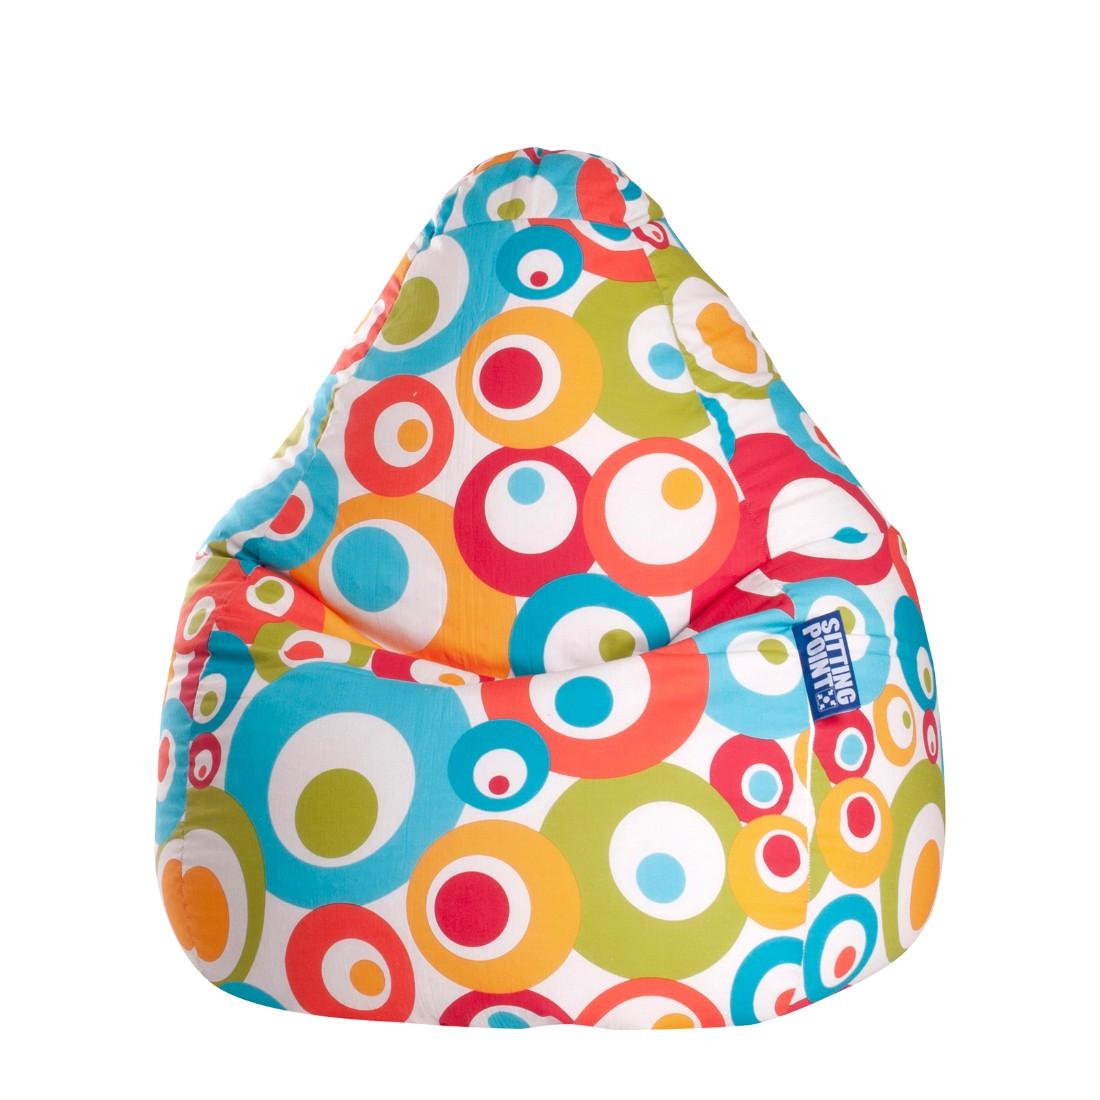 goedkoop Zitzak Malibu XL geweven stof Meerkleurig SITTING POINT